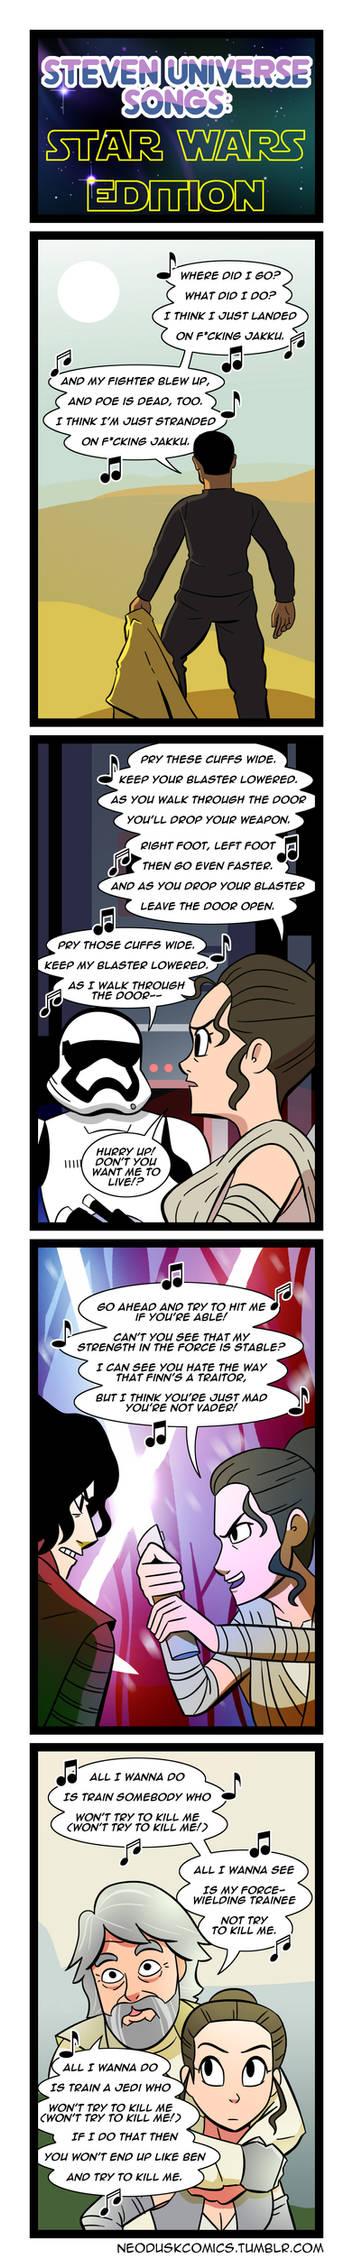 Star Wars x Steven Universe Medley